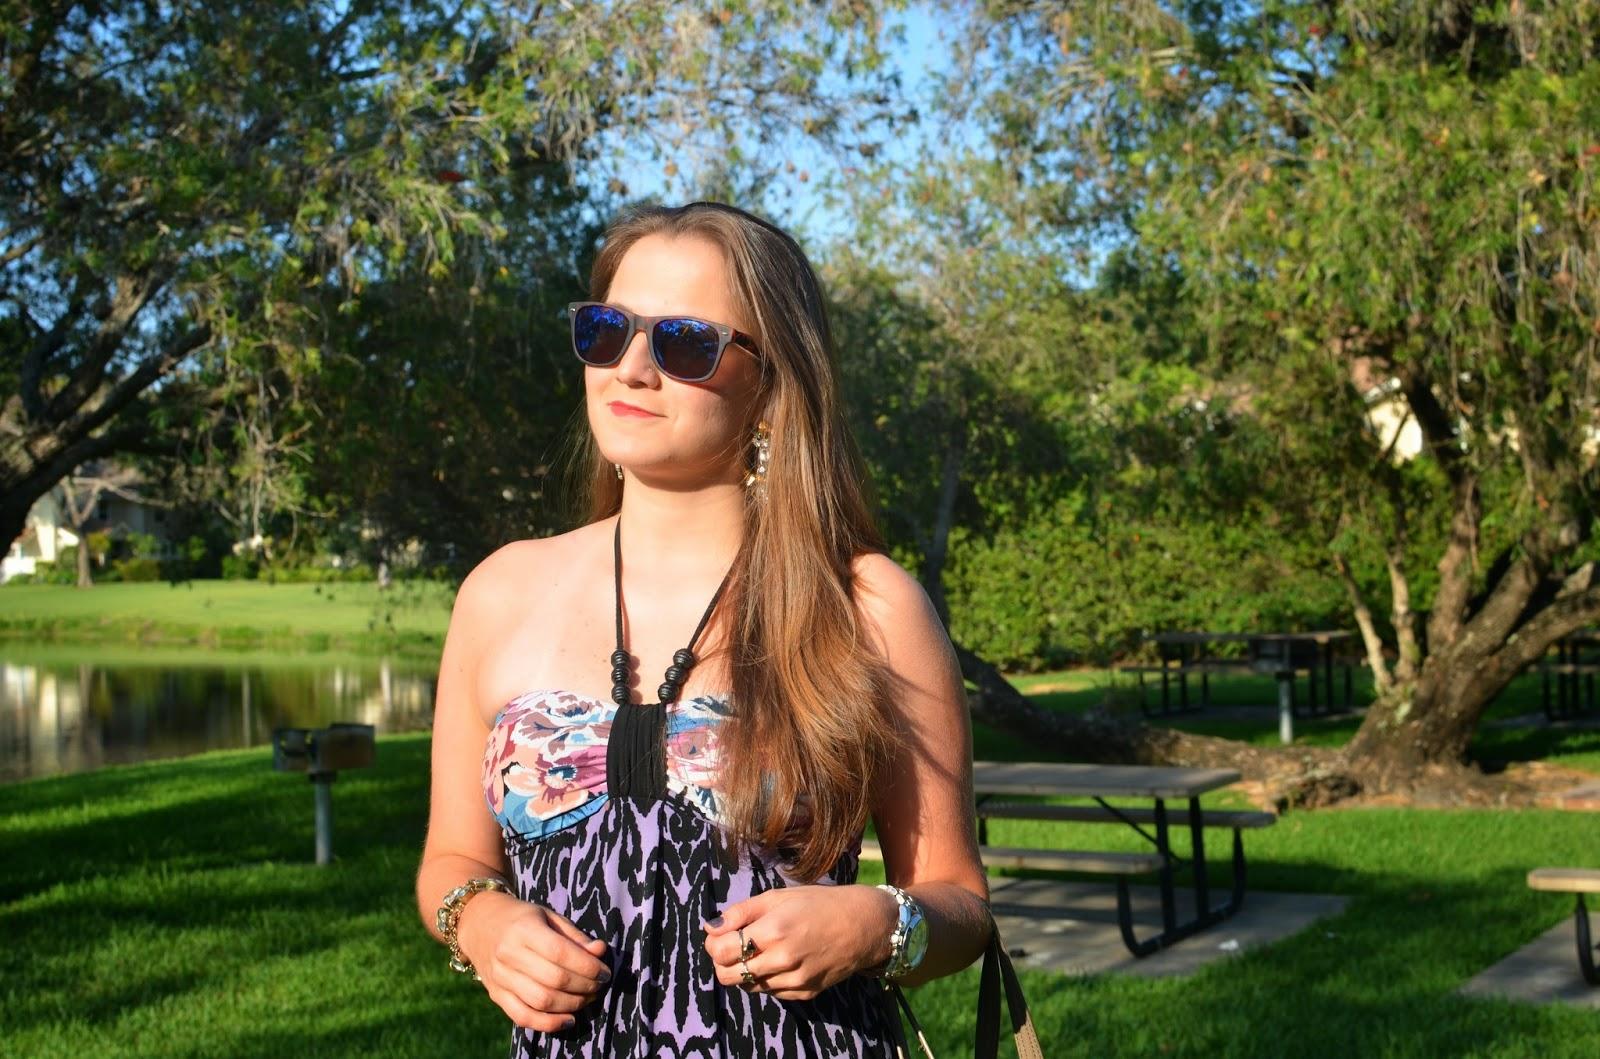 Floral maxi dress - studded bag - mirror wayfarers - Emma & Sophia